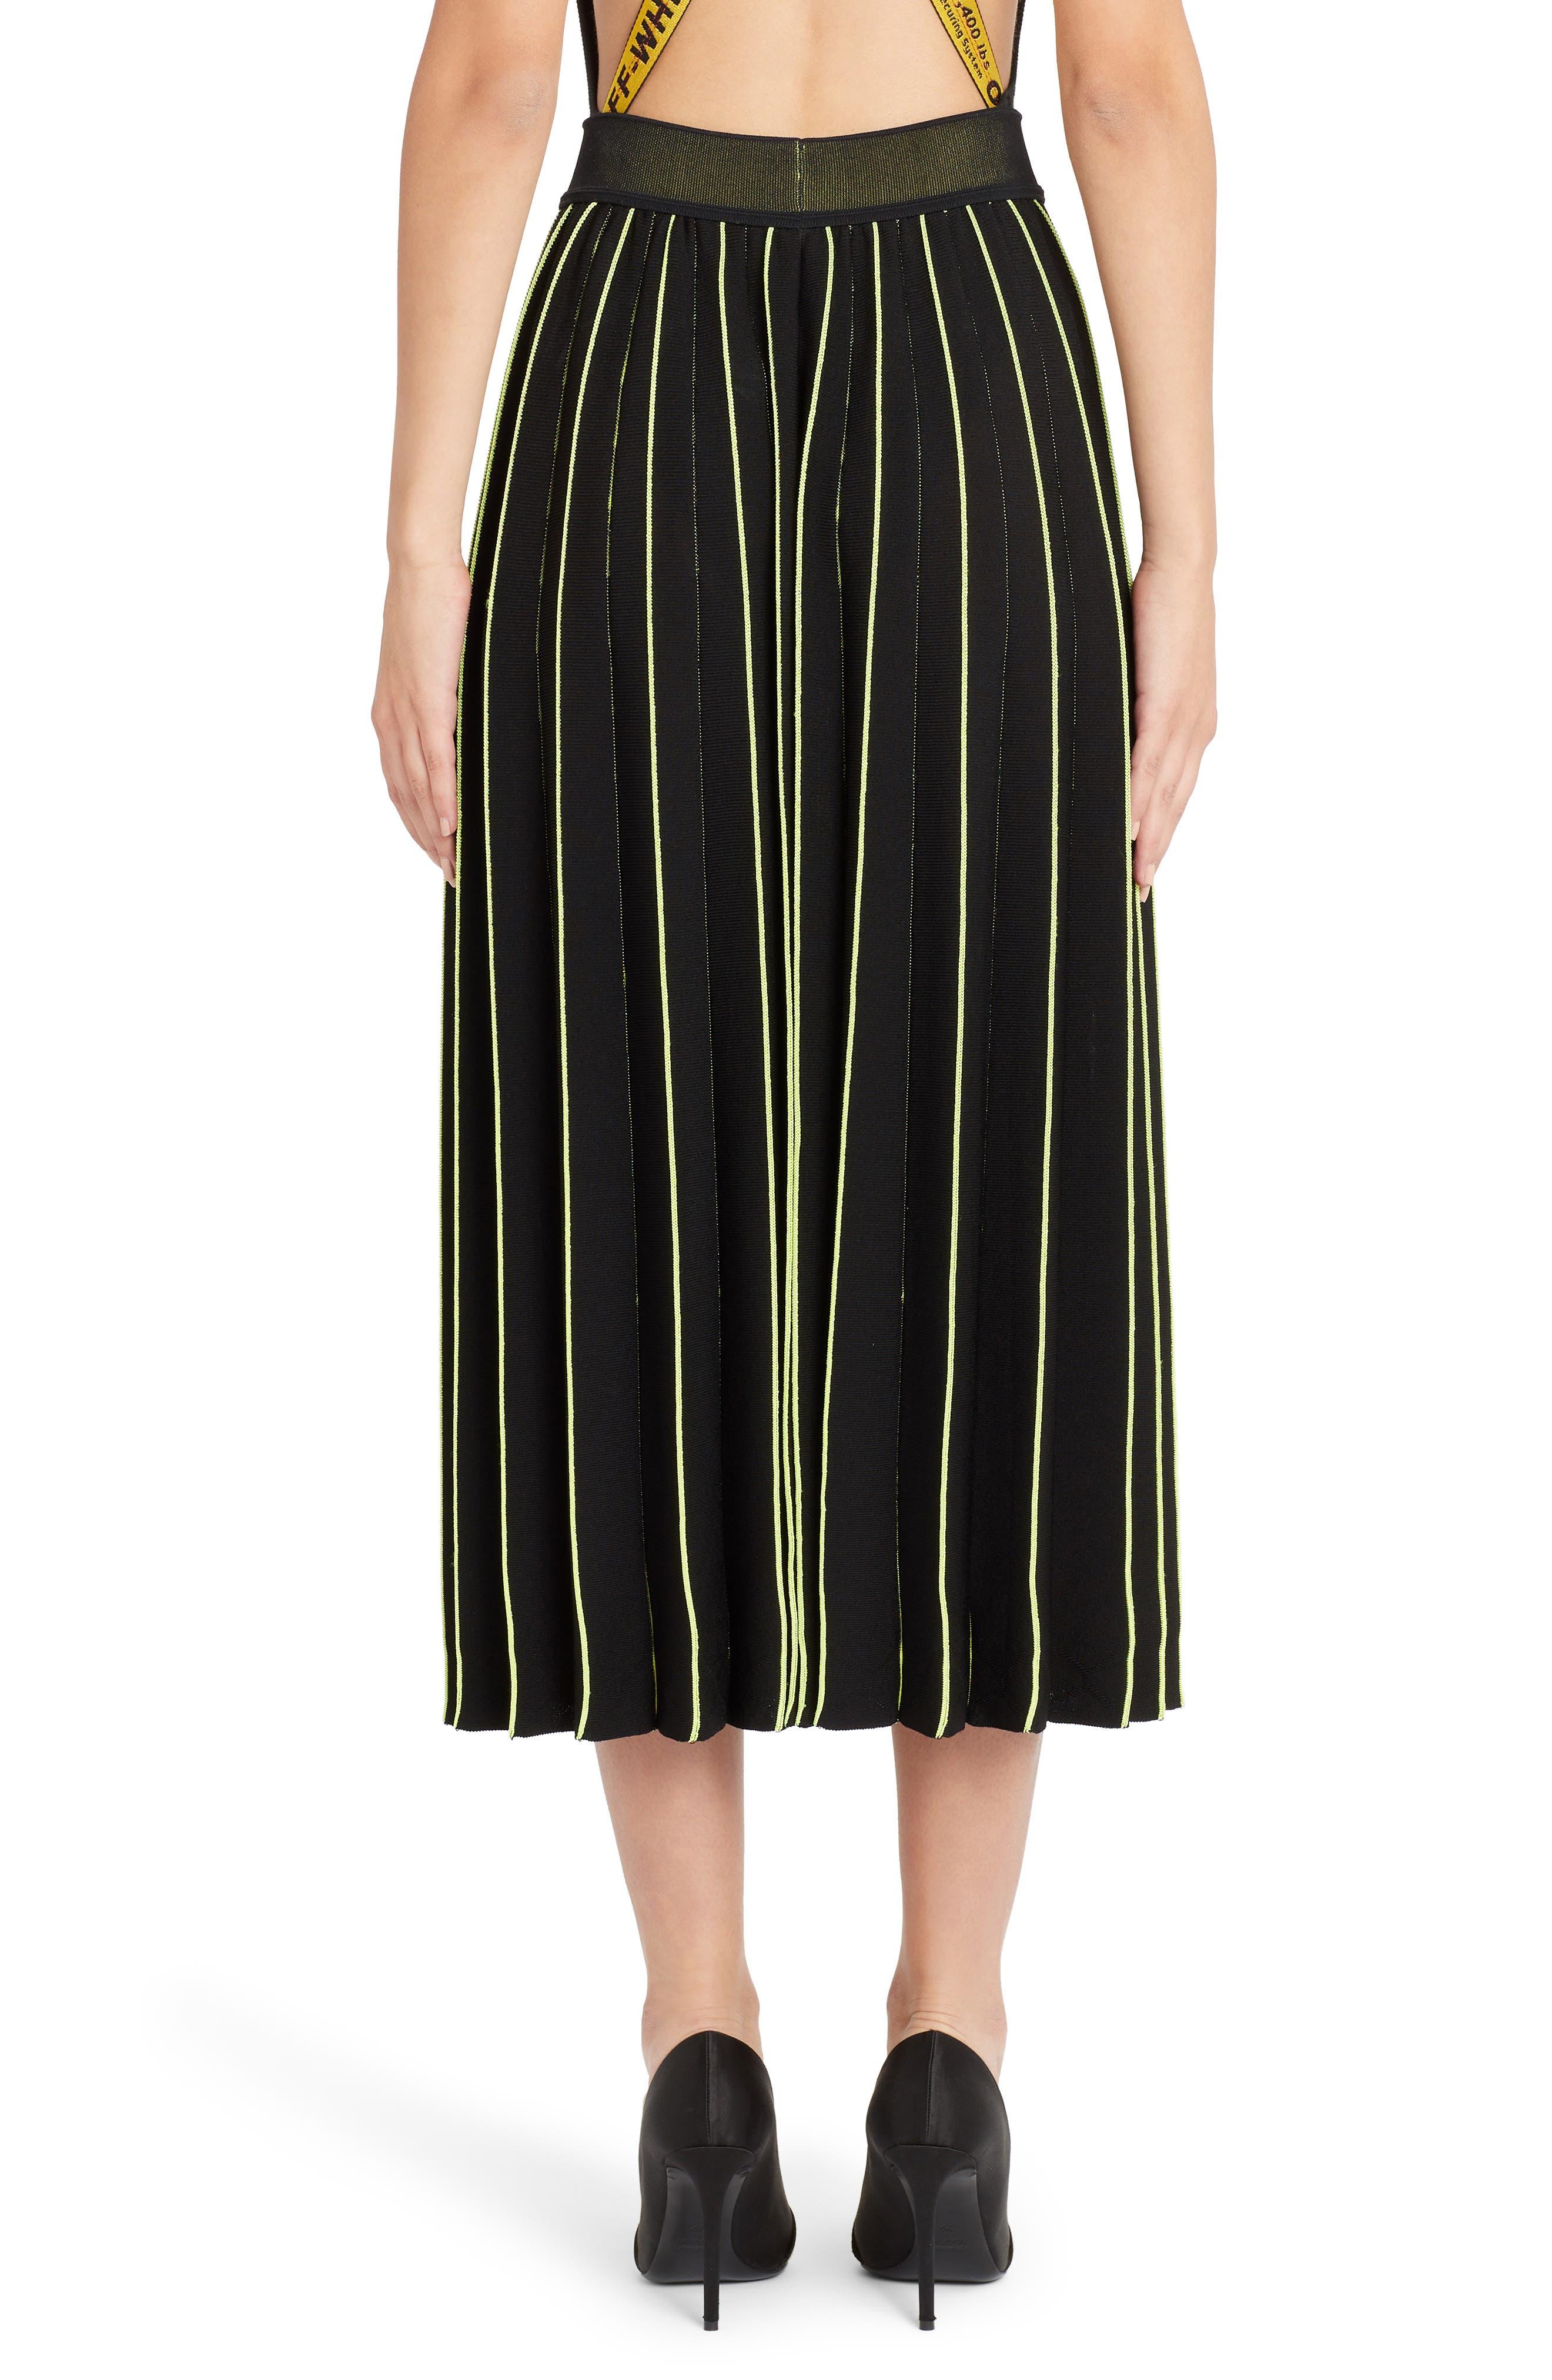 OFF-WHITE, Plissé Sweater Skirt, Alternate thumbnail 2, color, BLACK